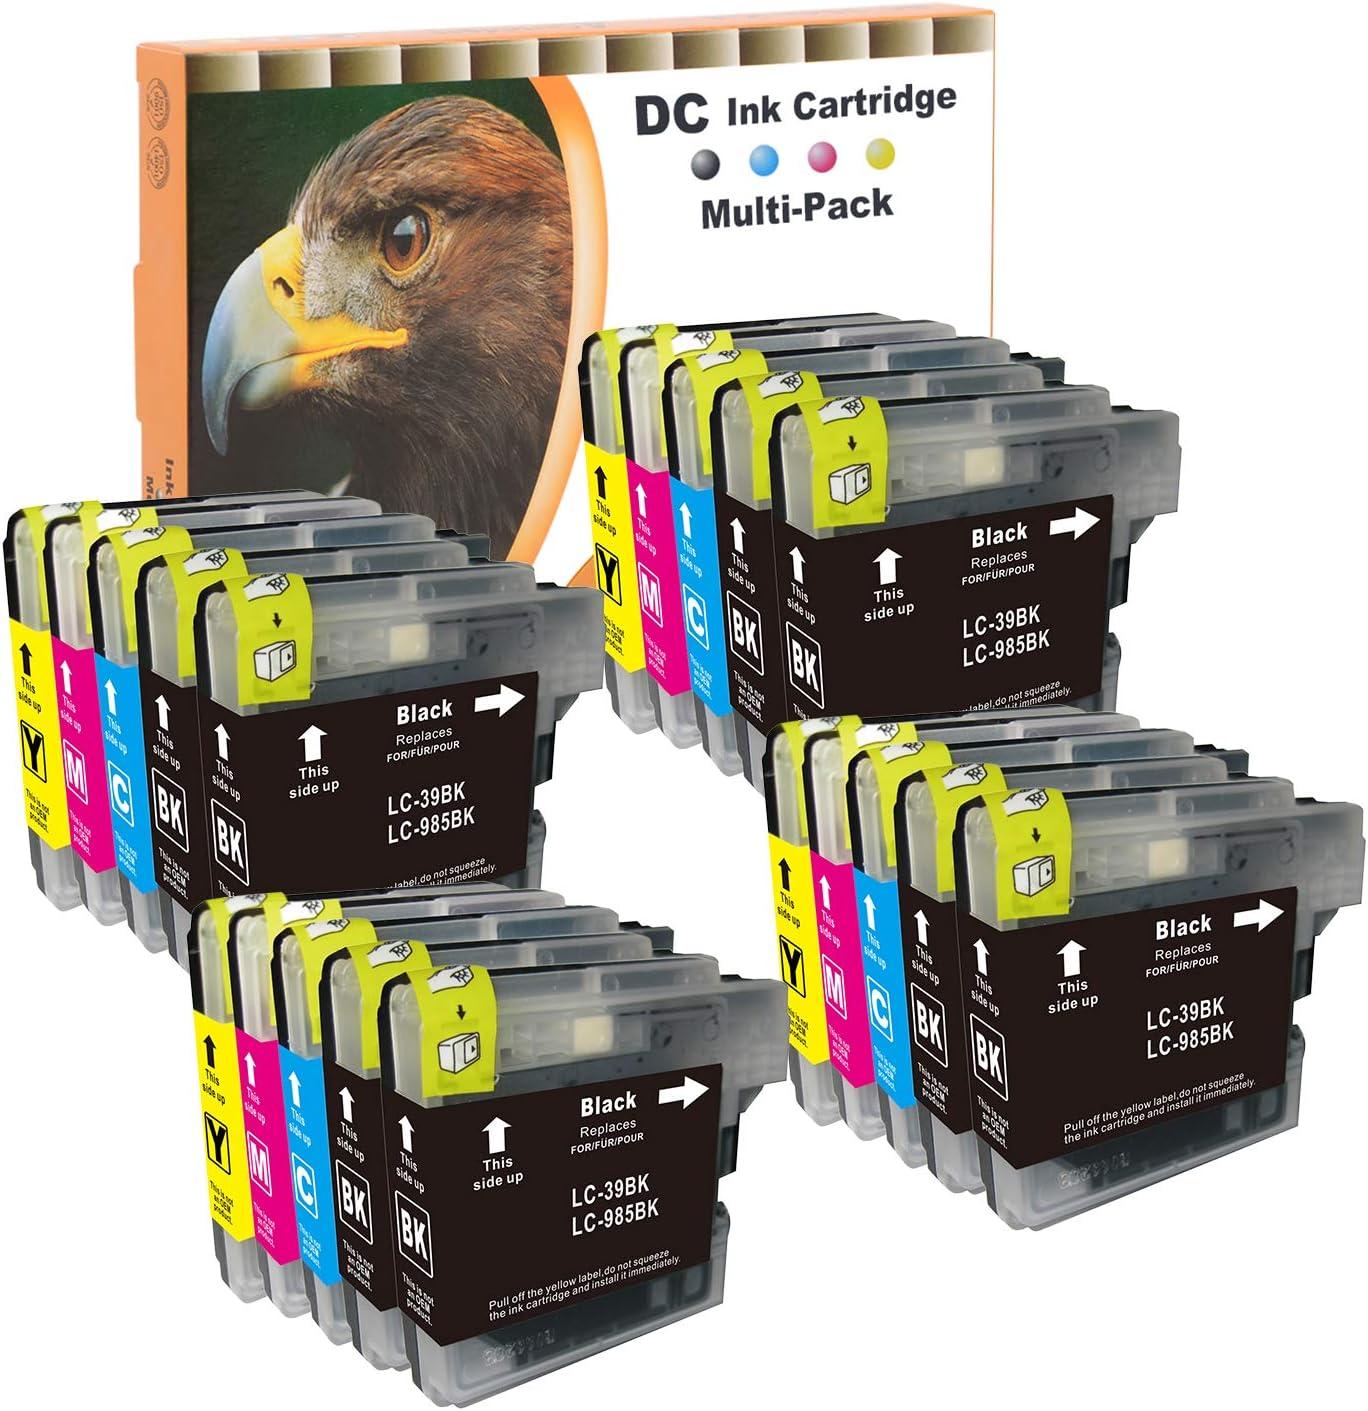 D C 20x Druckerpatronen Xl Kompatibel Für Brother Lc985 Lc 985 Lc 39 Lc 975 Für Brother Dcp J 125 Dcp J 140 W Dcp J 315 W Dcp J 515 W Mfc J 220 Mfc J 265 W Mfc J 410 Mfc J